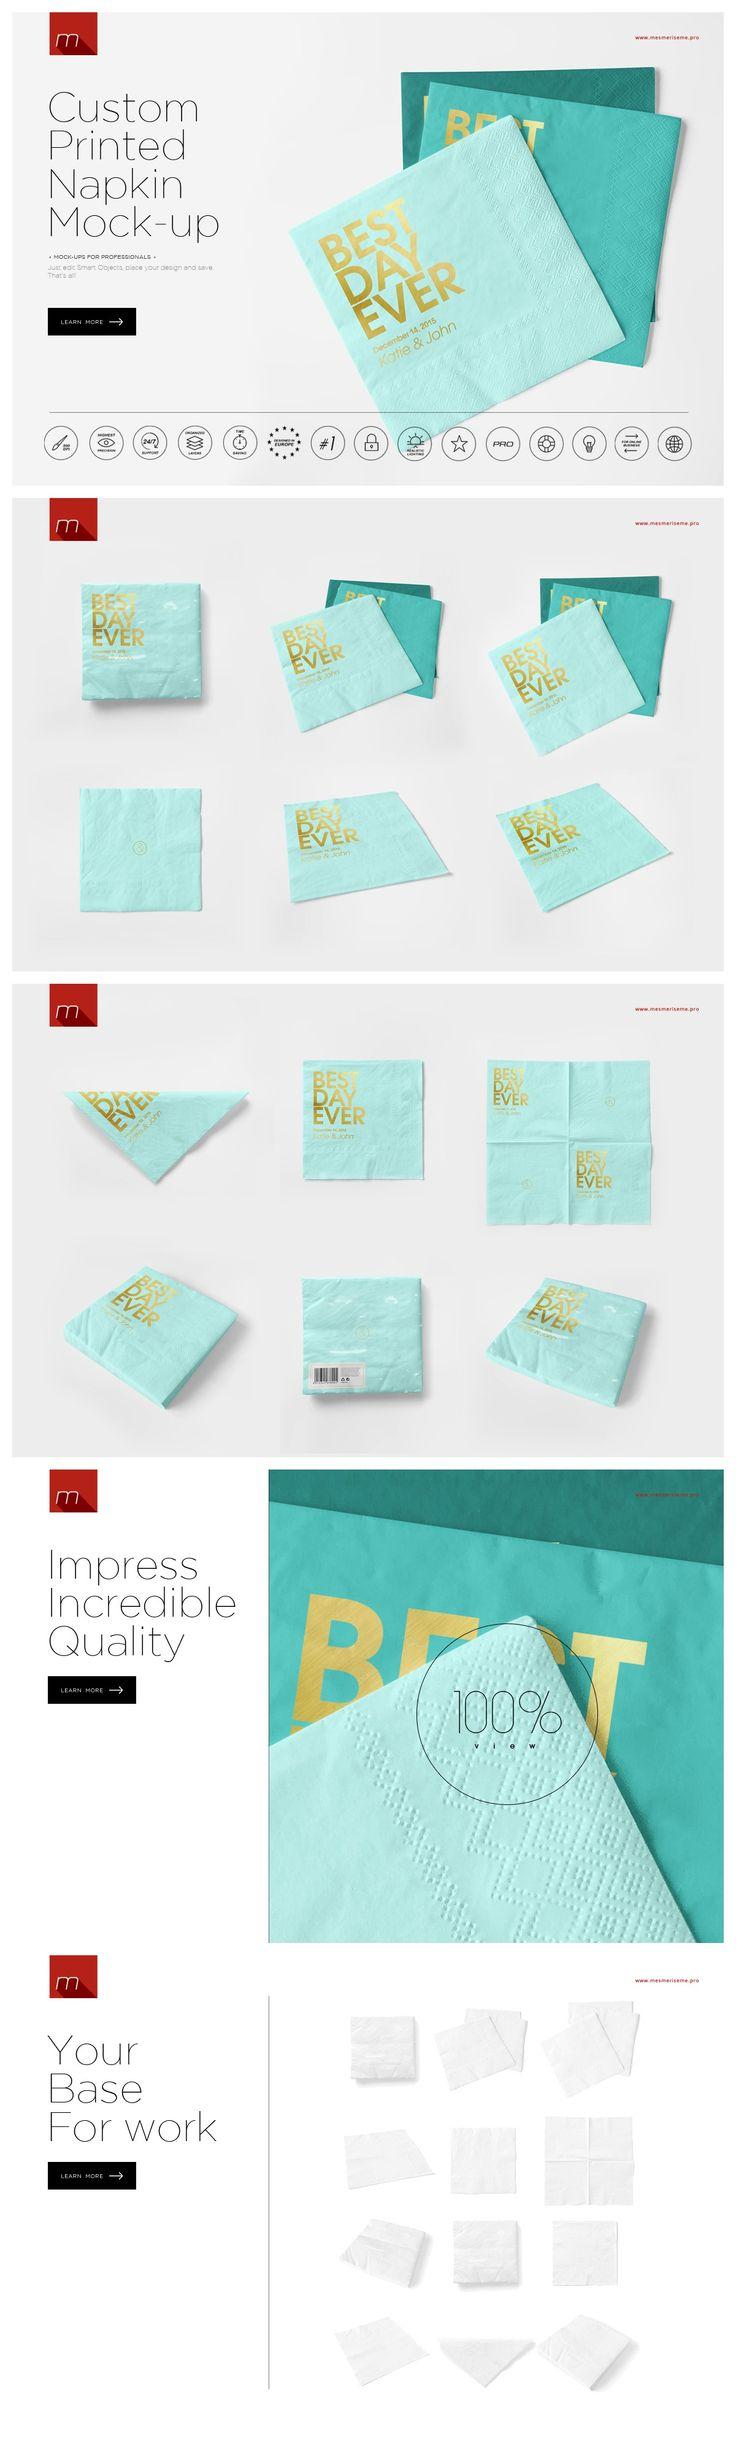 Custom Printed Napkin Mock-up https://creativemarket.com/mesmeriseme.pro/419941-Custom-Printed-Napkin-Mock-up?u=MeeraG | #mockup #mock-up #template #wedding #napkin #printed #napkins #cutlery #mat #placemat #placemats #paper #custom